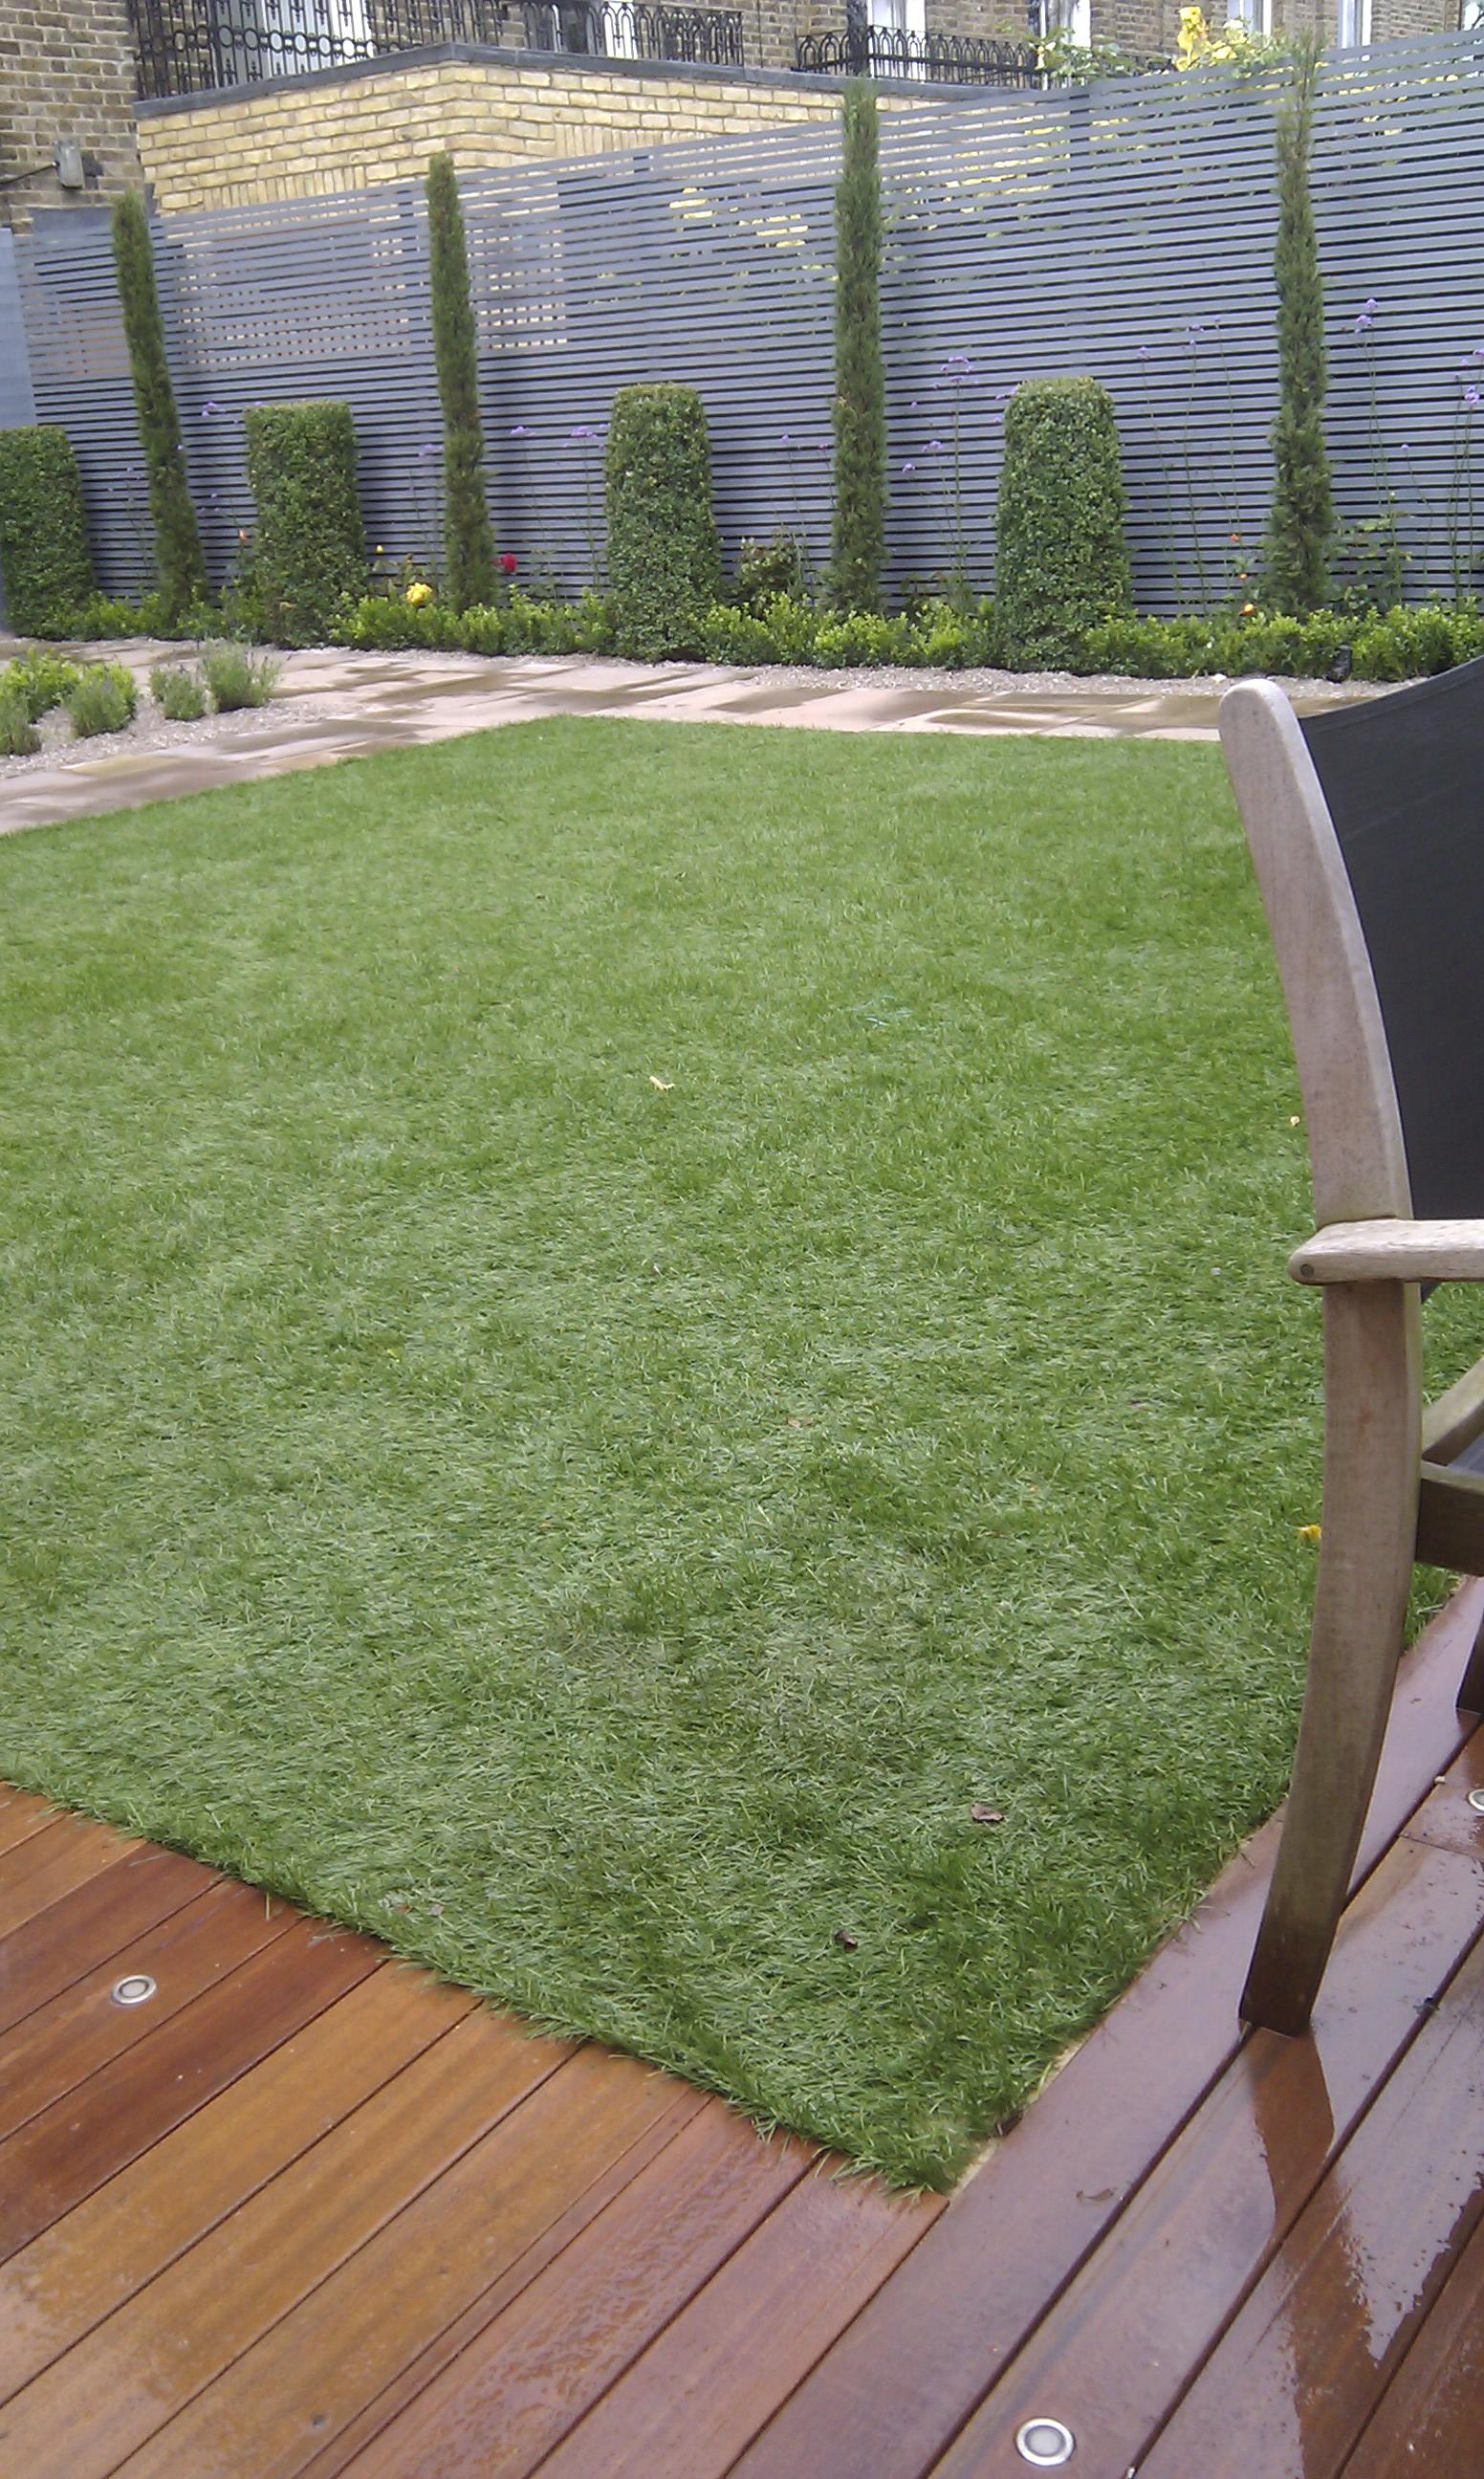 modern garden design london slatted grey privacy screen sandstone paving easy grass balau hardwood decking (12)